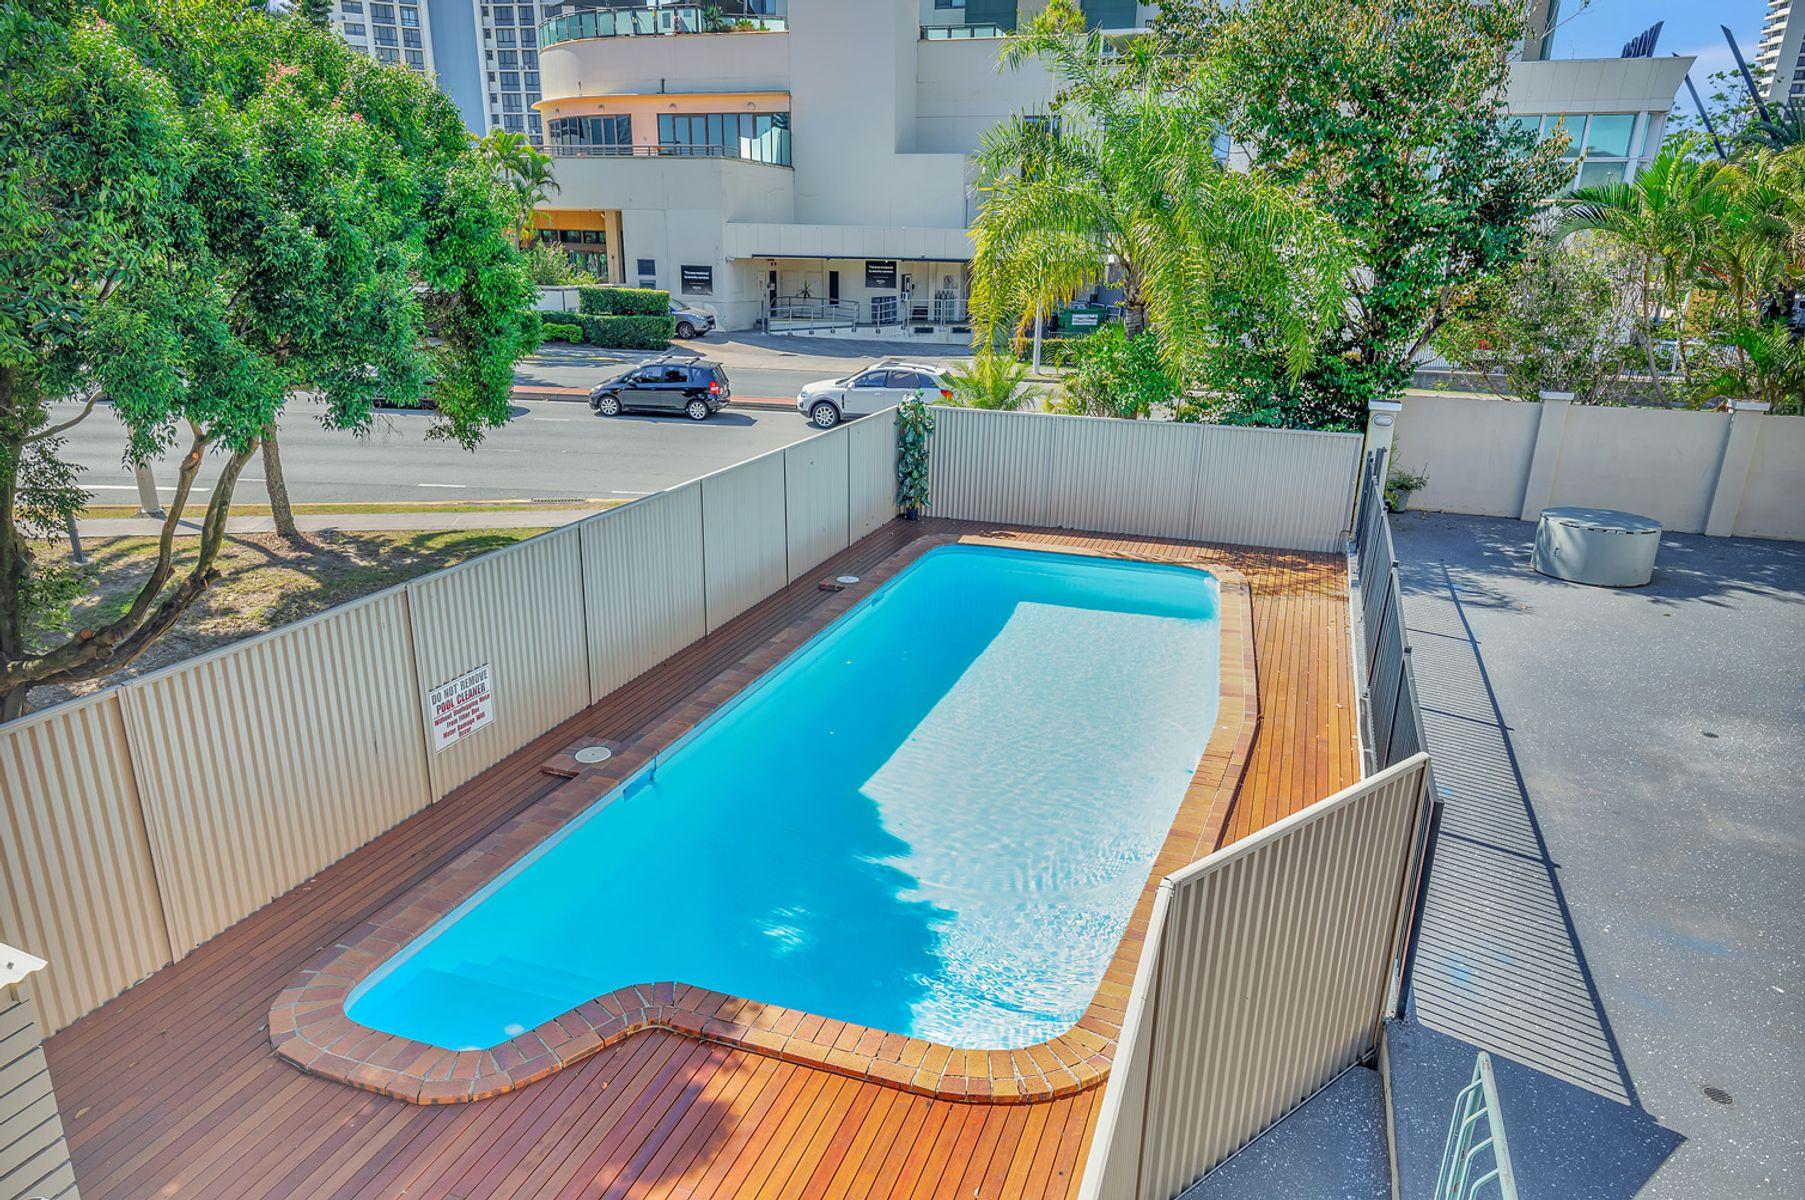 10/34 Remembrance Drive, Surfers Paradise, QLD 4217